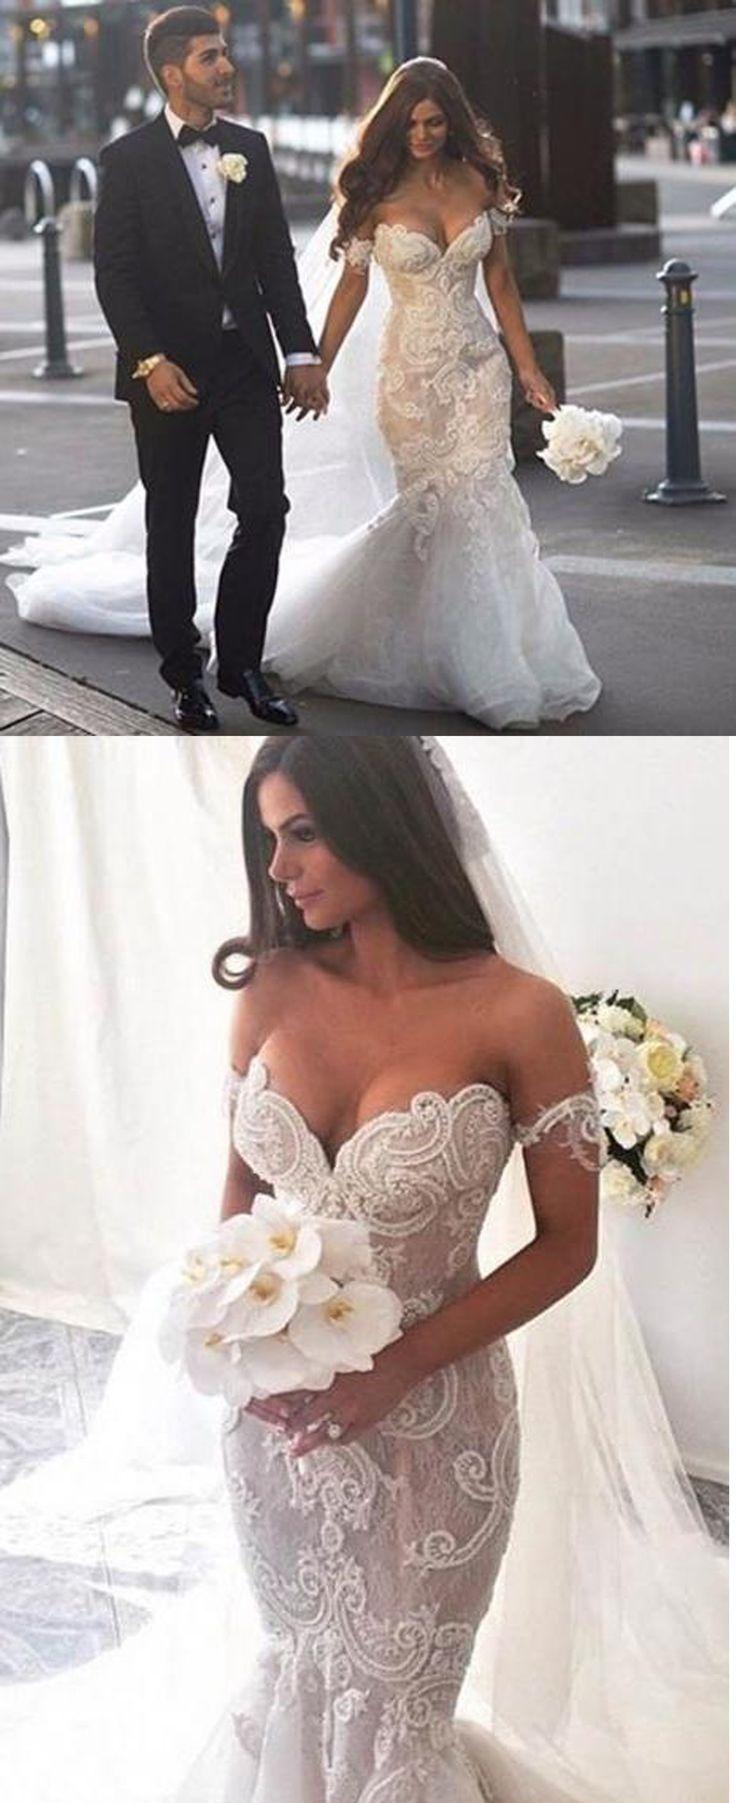 Best 25 off white wedding dresses ideas on pinterest wedding white wedding dress lace mermaid wedding dresses 2017 off the shoulder wedding dresses ombrellifo Choice Image